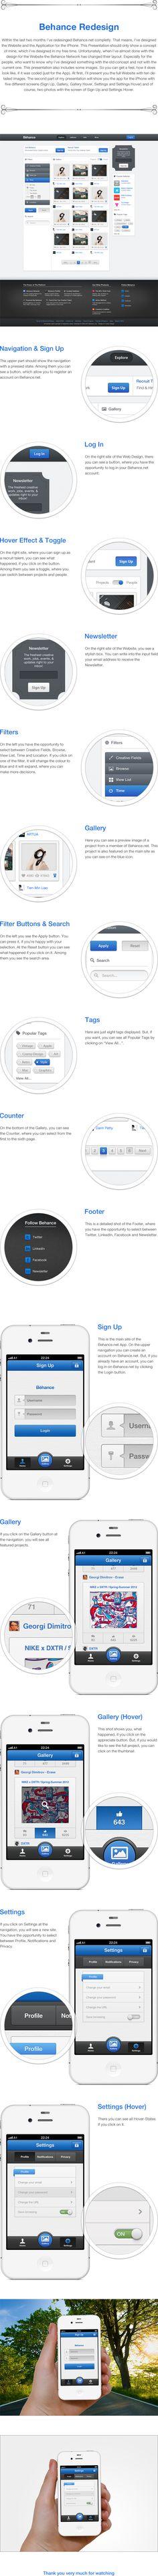 Behance Redesign by Daniel Fass, via Behance  #digitaldesign #design